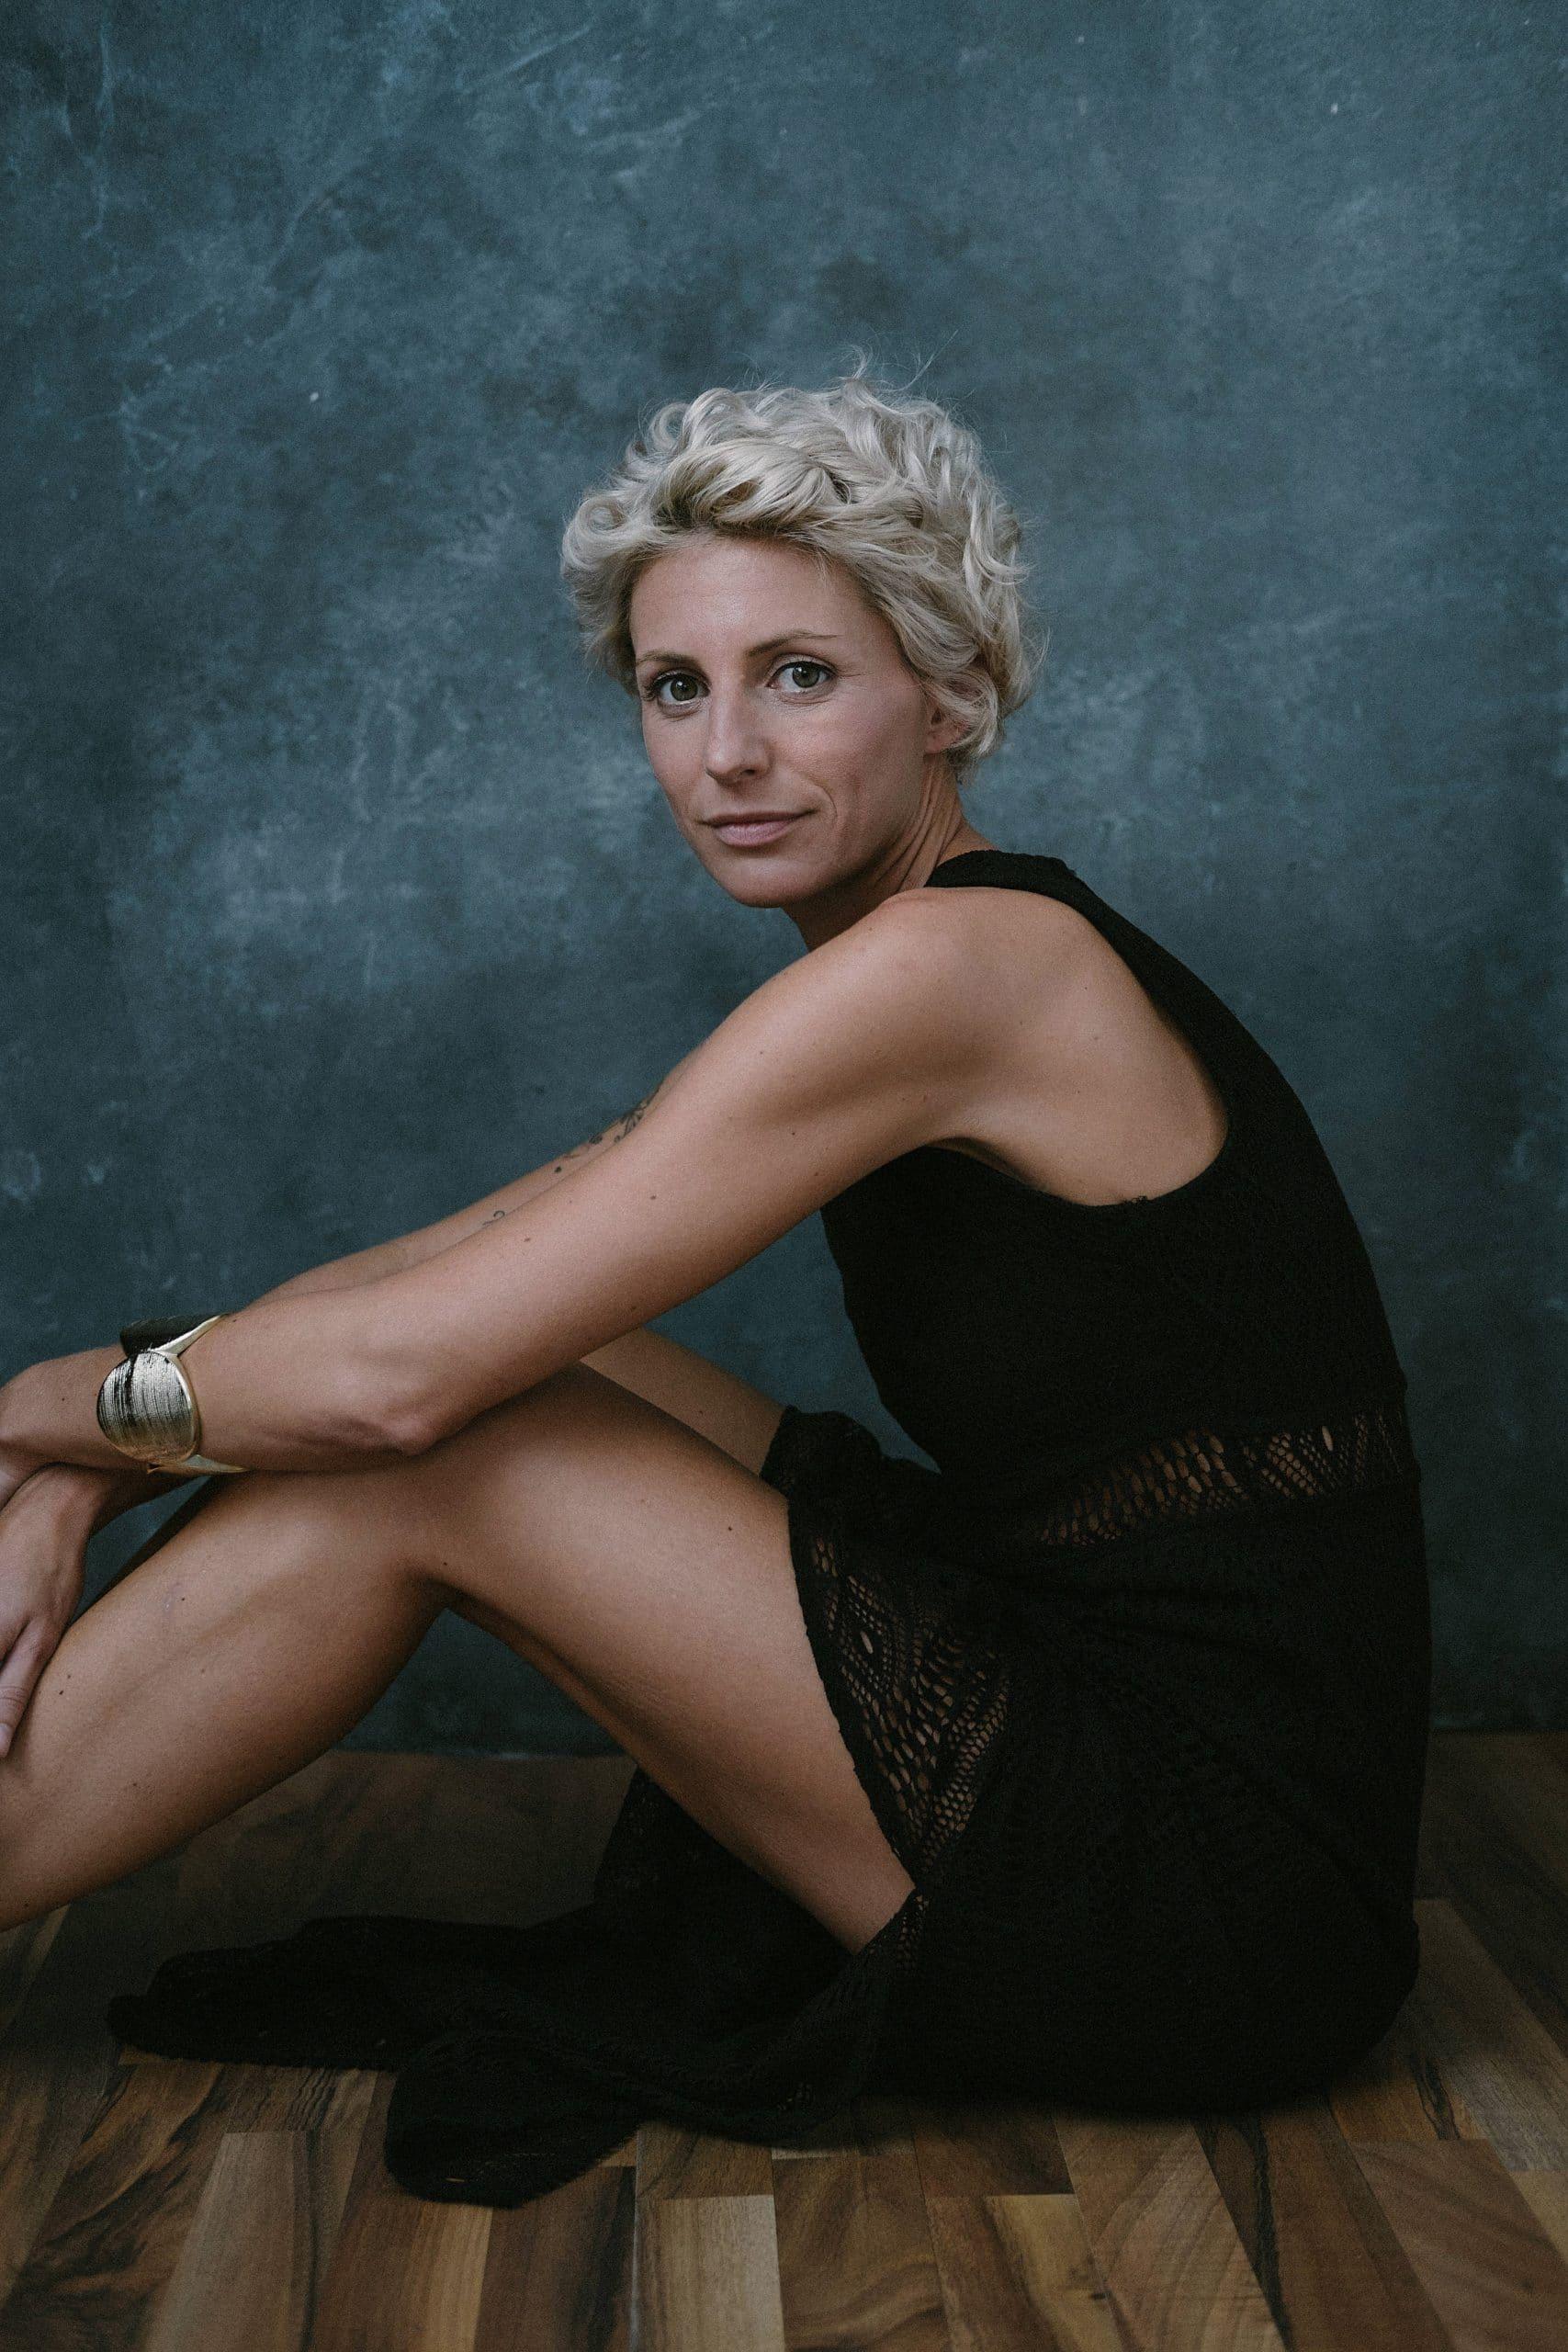 Steffi, Fitnesstrainerin